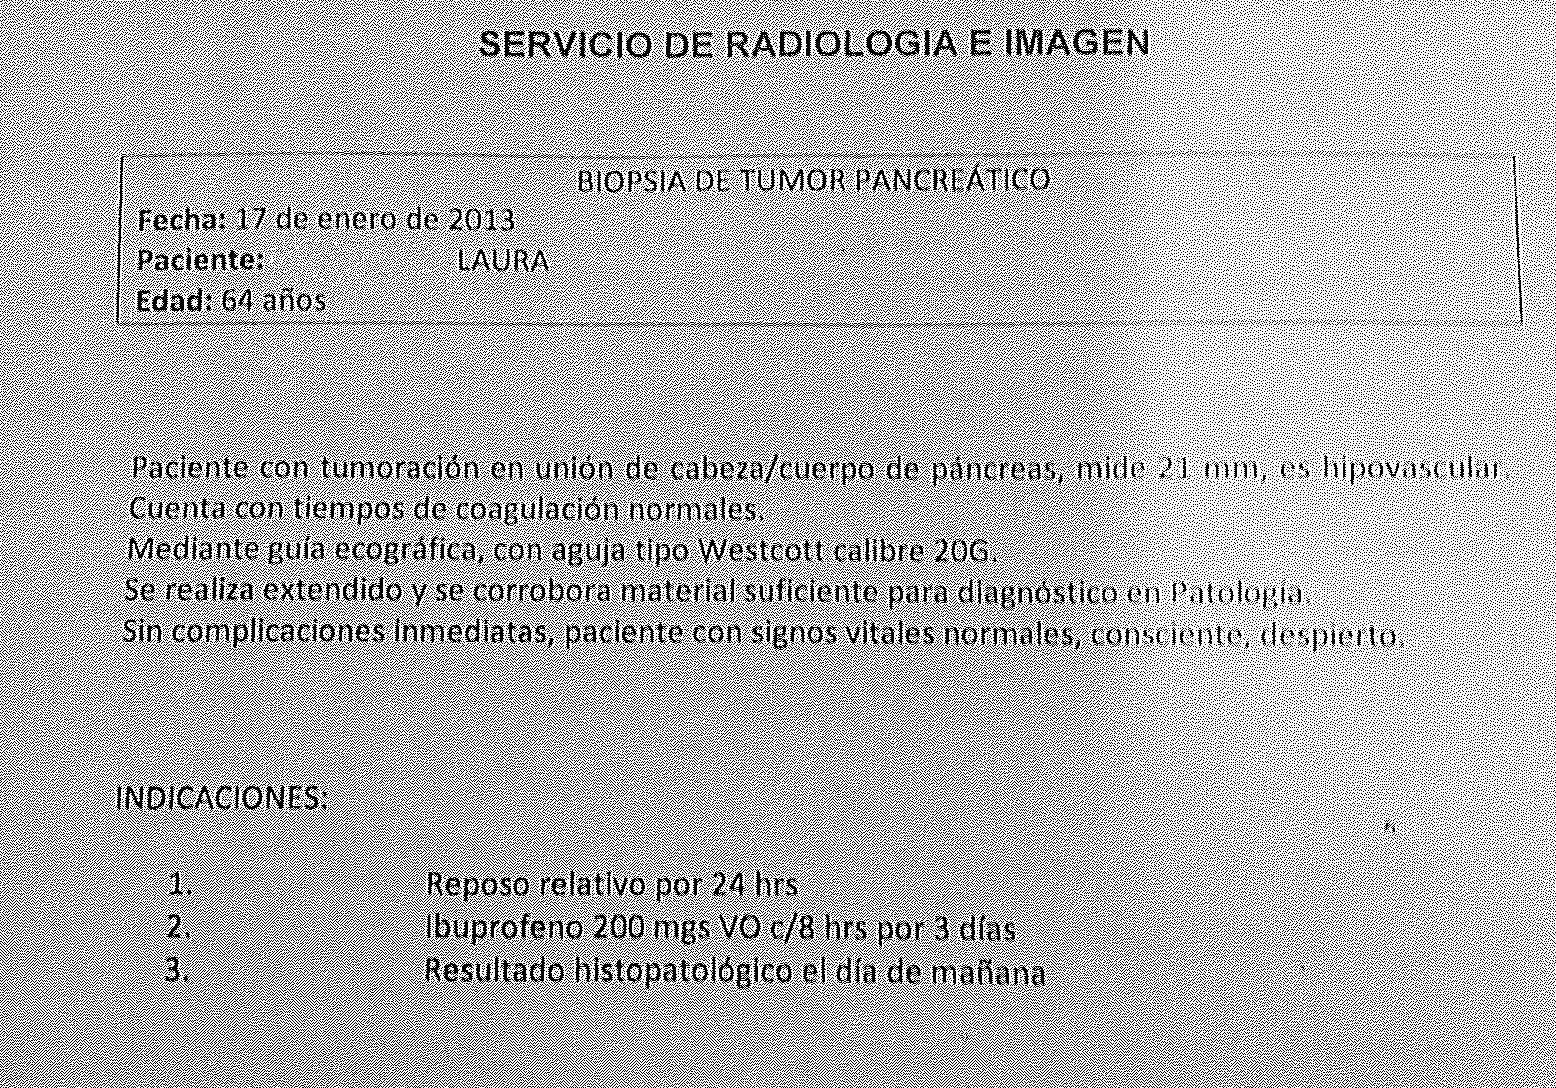 LifEscozul® - Laura 8 - Cáncer de Páncreas